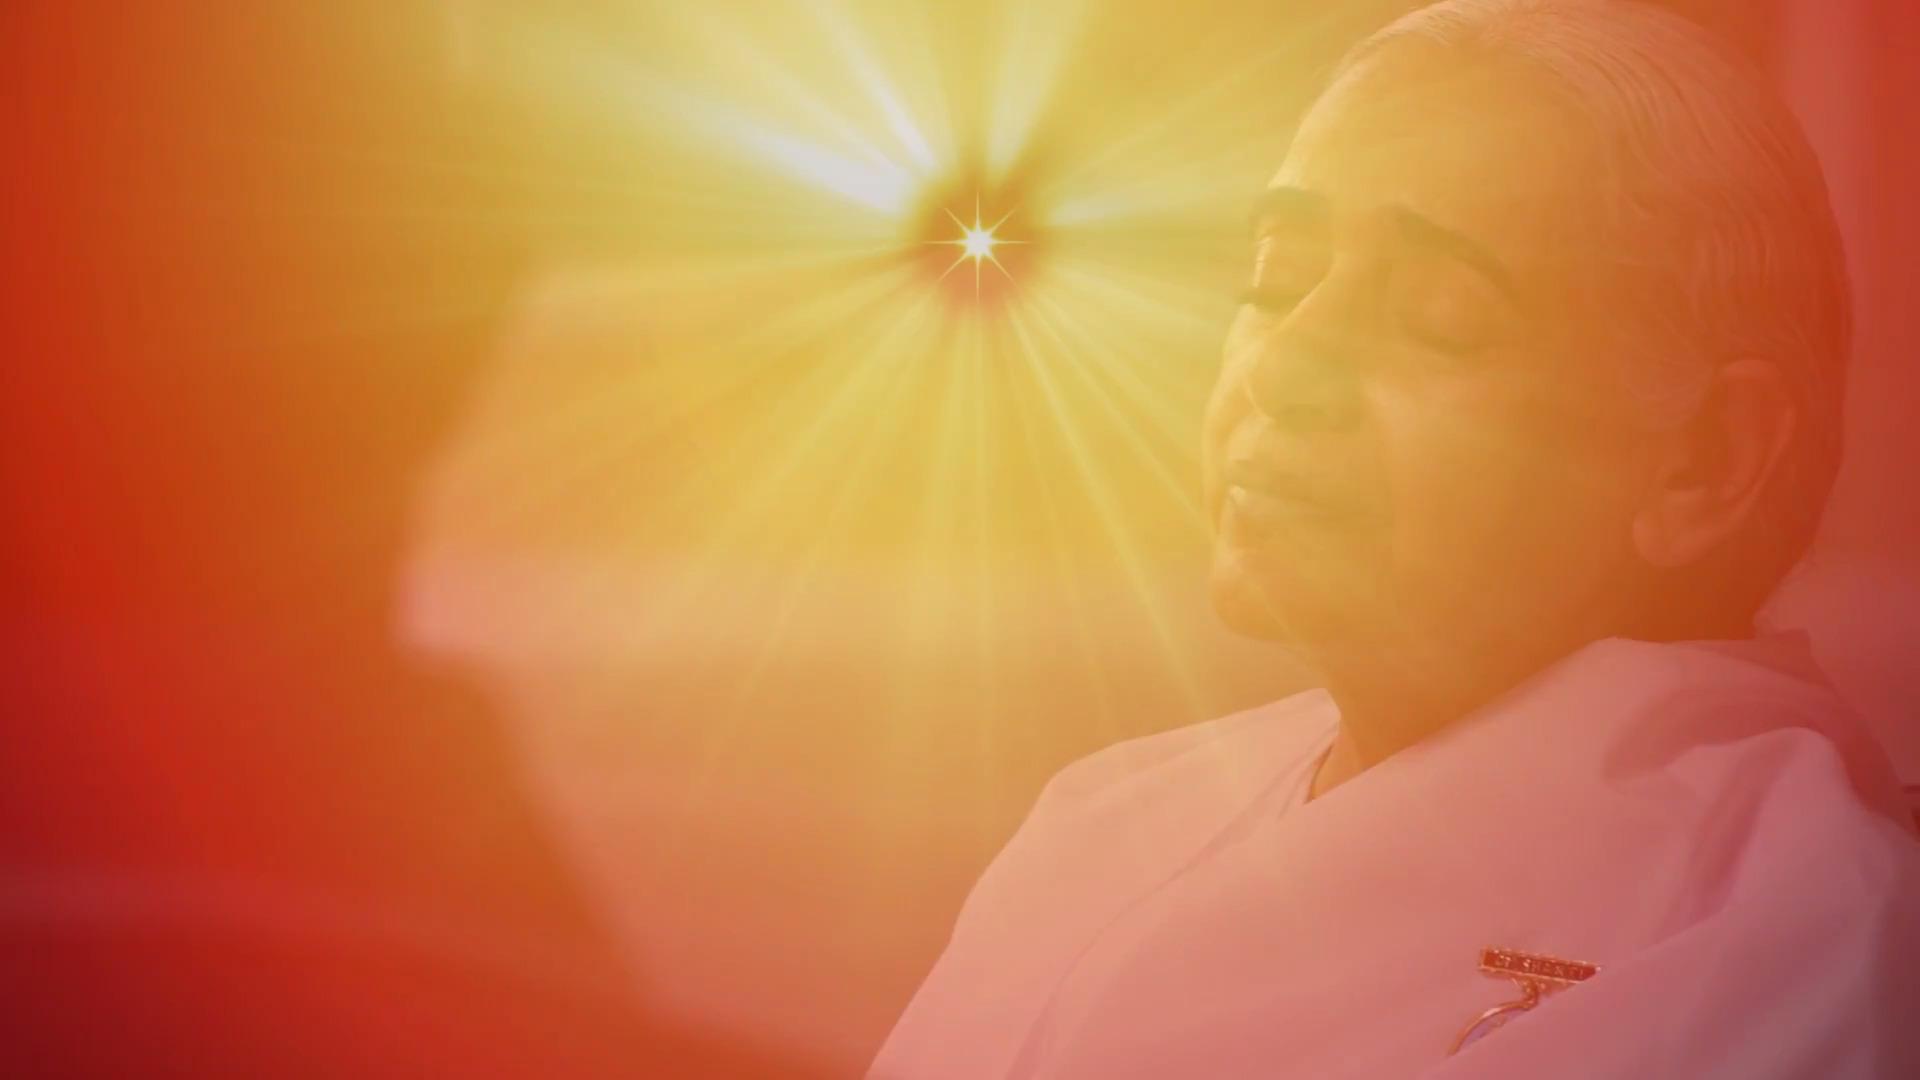 A Meditation Experience on Forgiveness